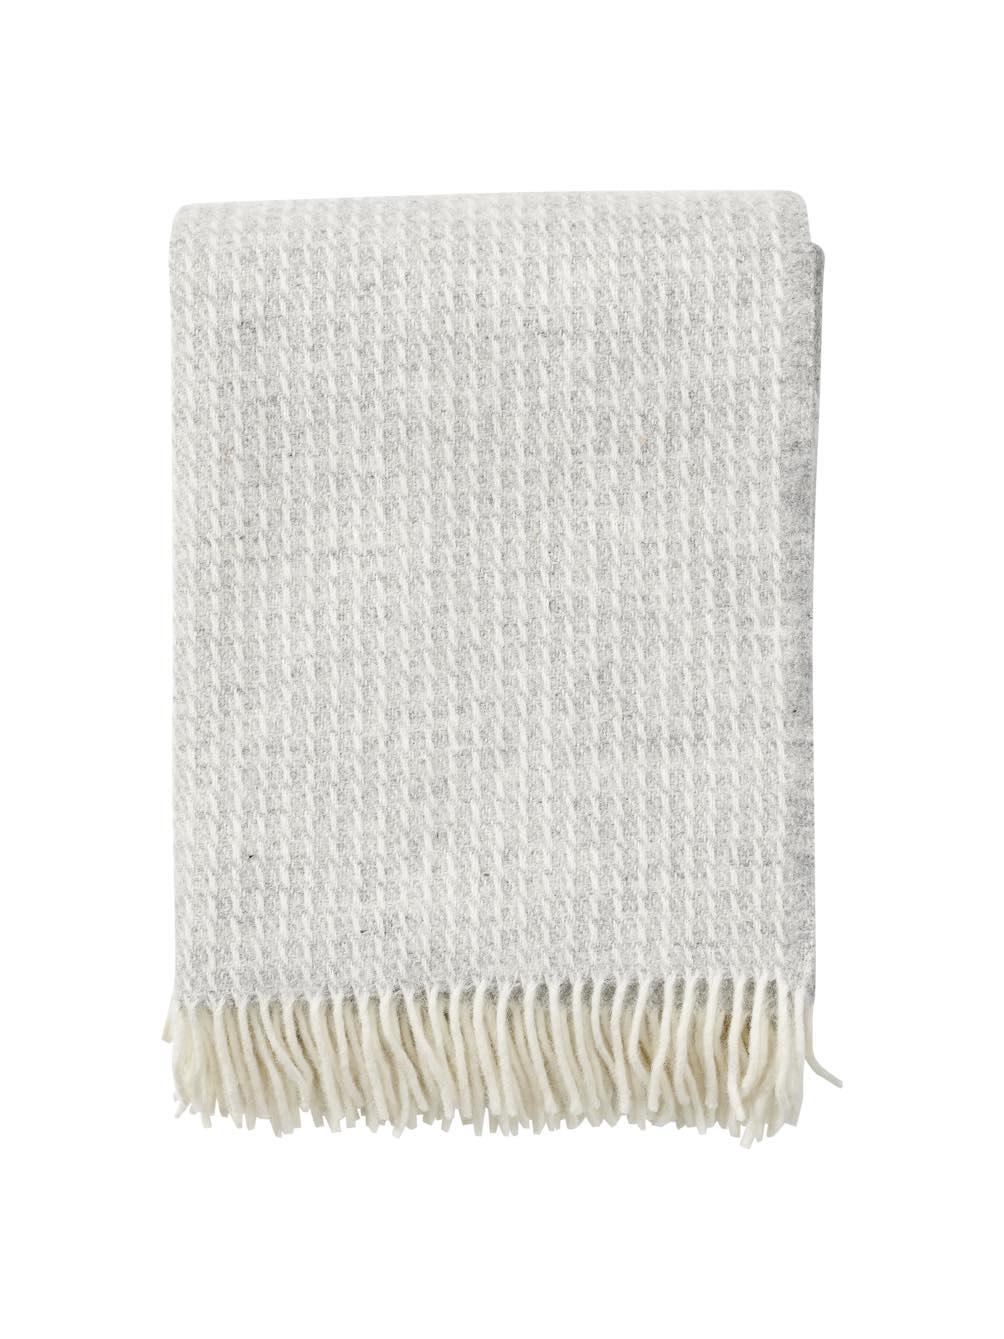 Line Light Grey Blanket/Throw